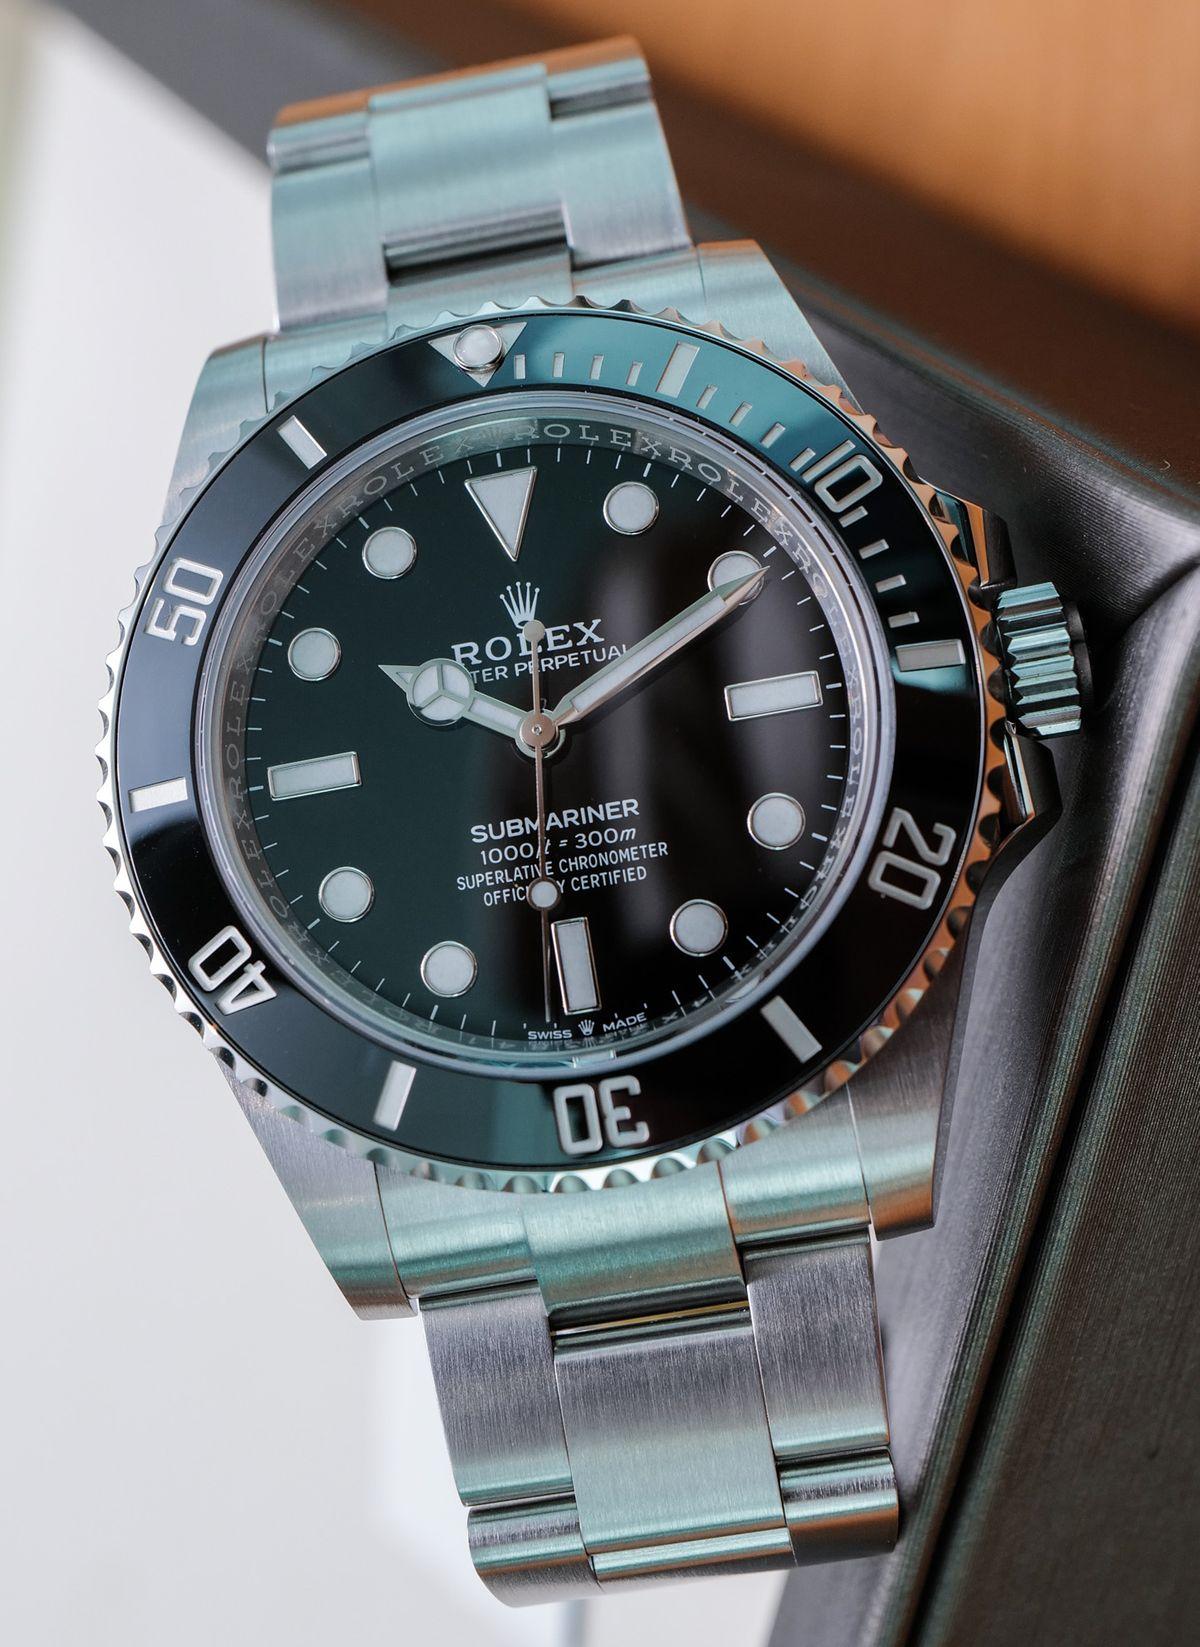 Rolex Submariner 124060 No-Date Stainless Steel